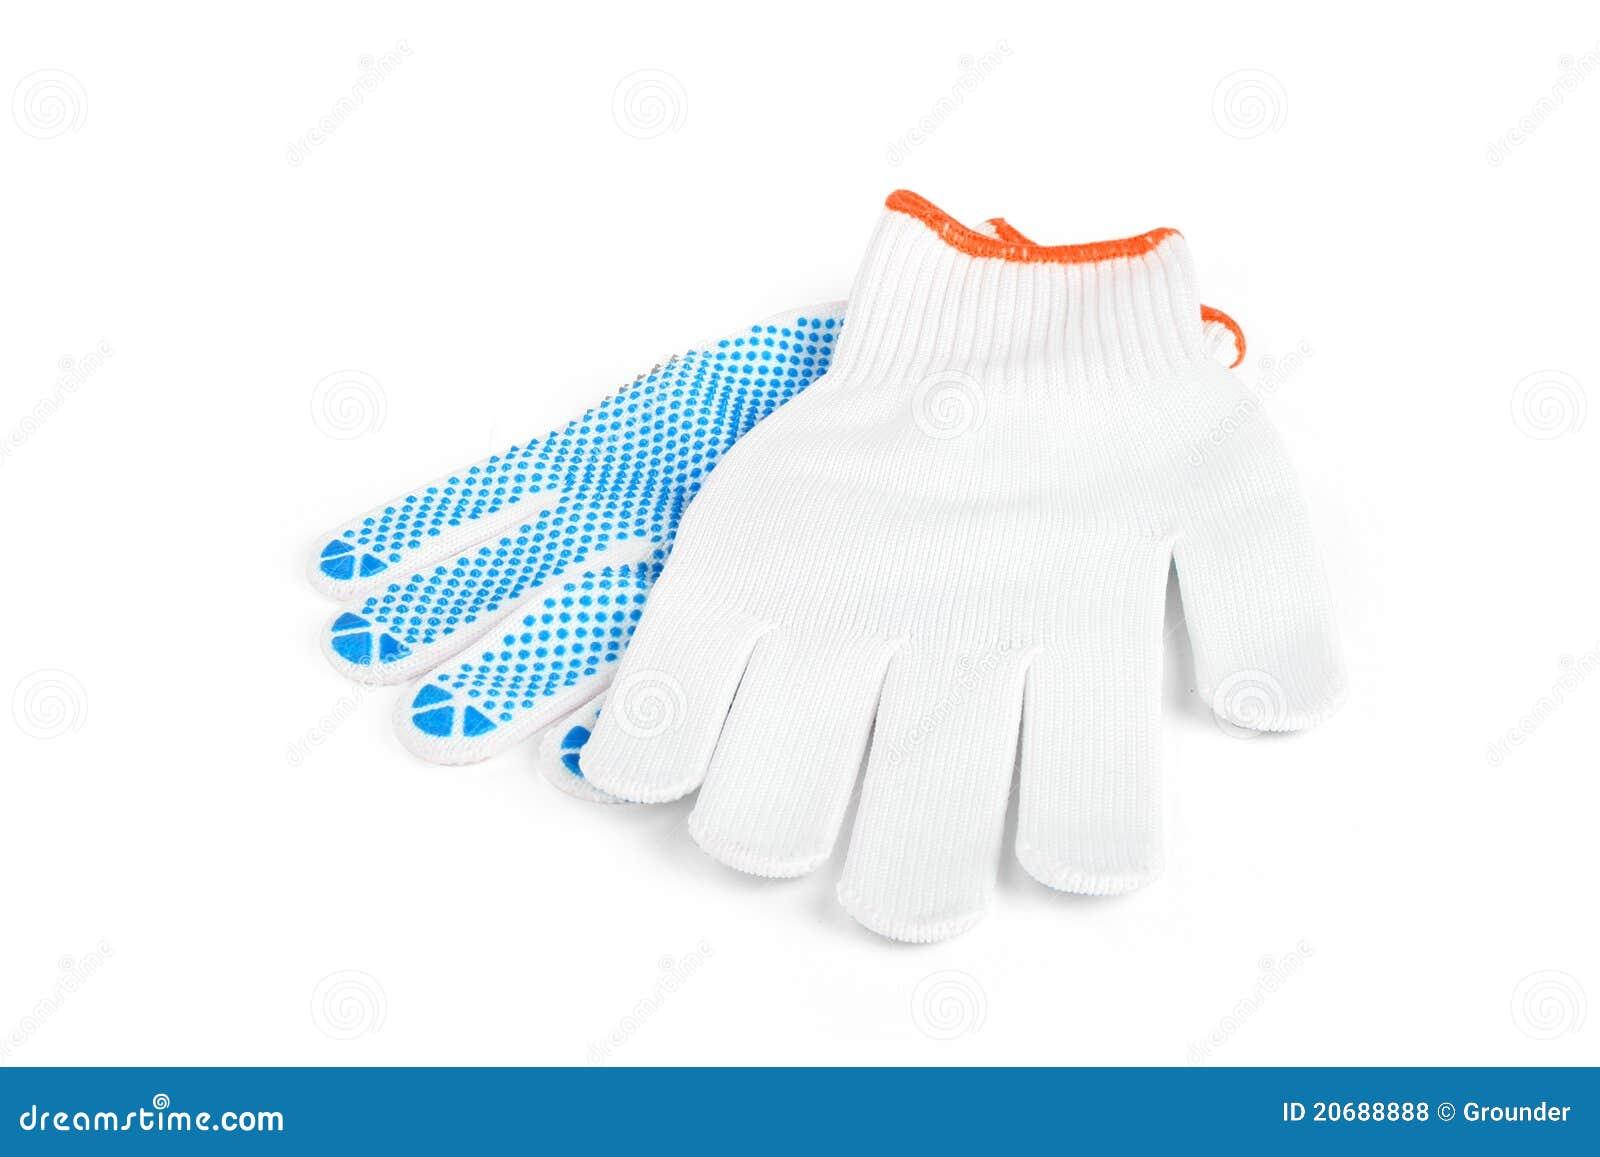 Gardening Gloves Royalty Free Stock Photos Image 20688888